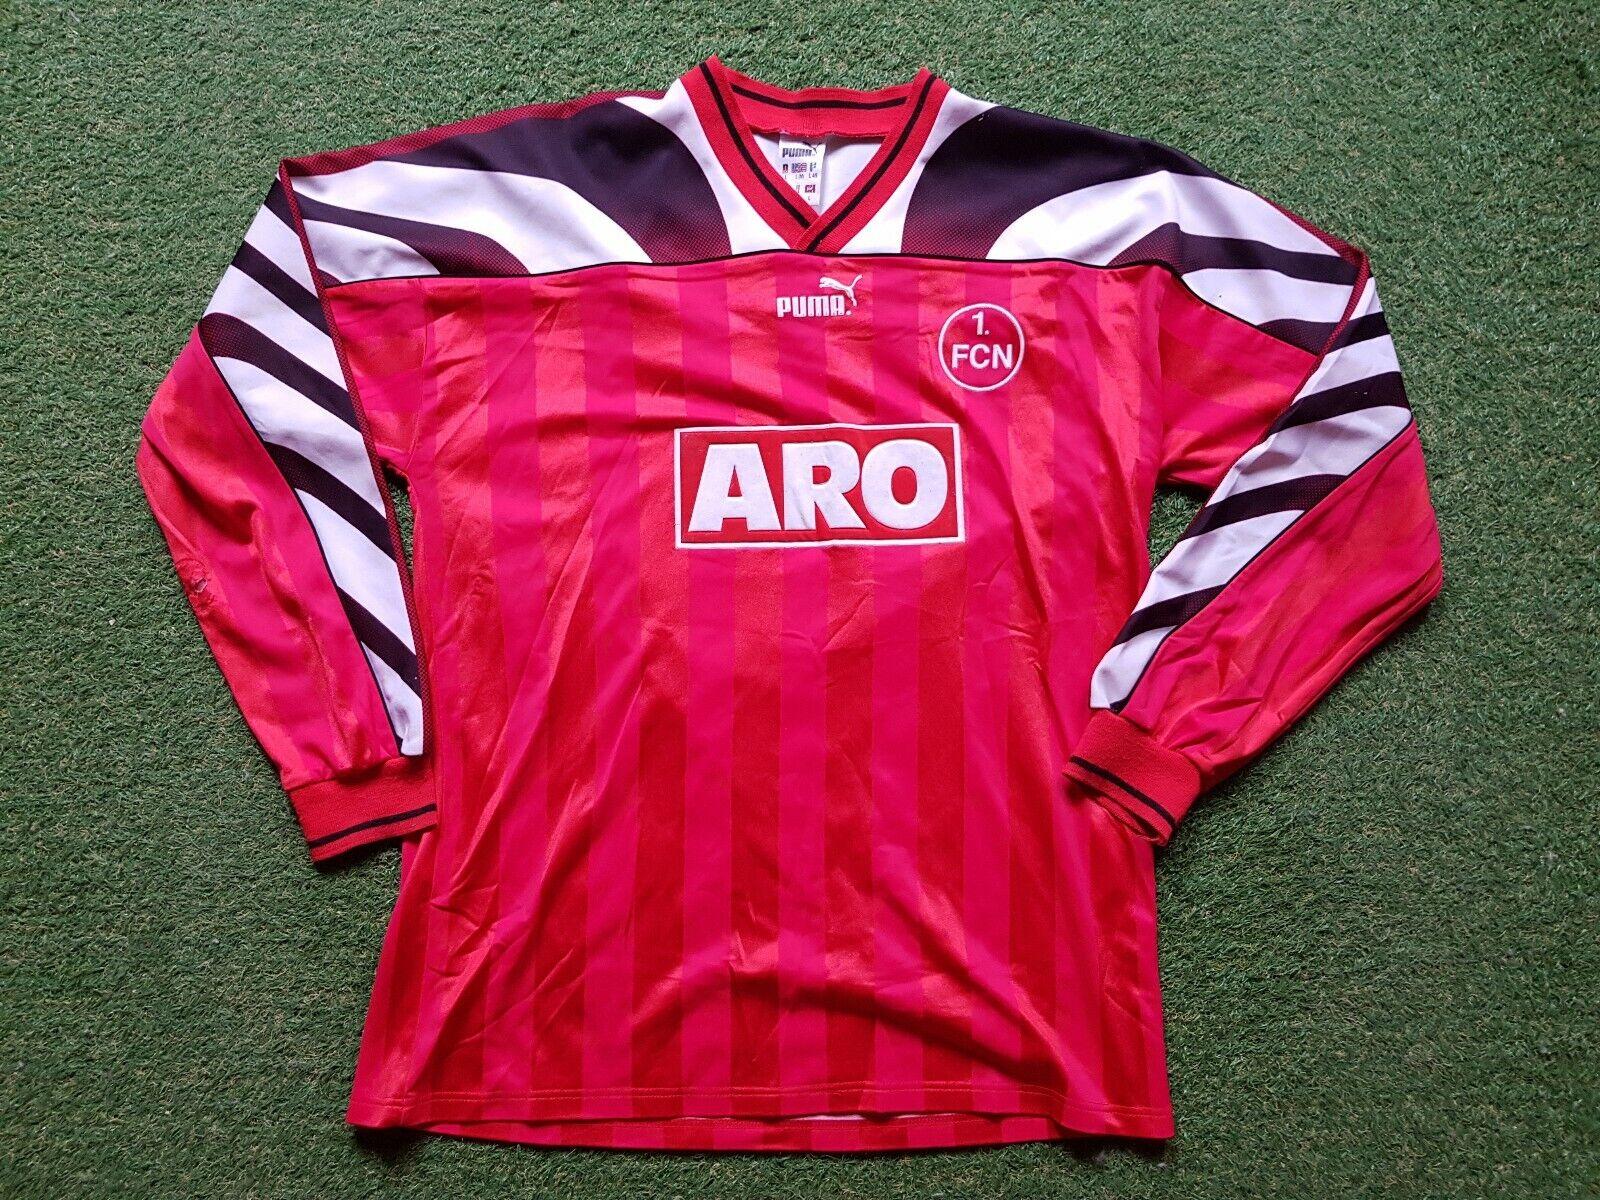 1. FC Nuremberg Maillot L 1995 1996 Puma Fcn Football Camiseta Jersey Aro Kurth